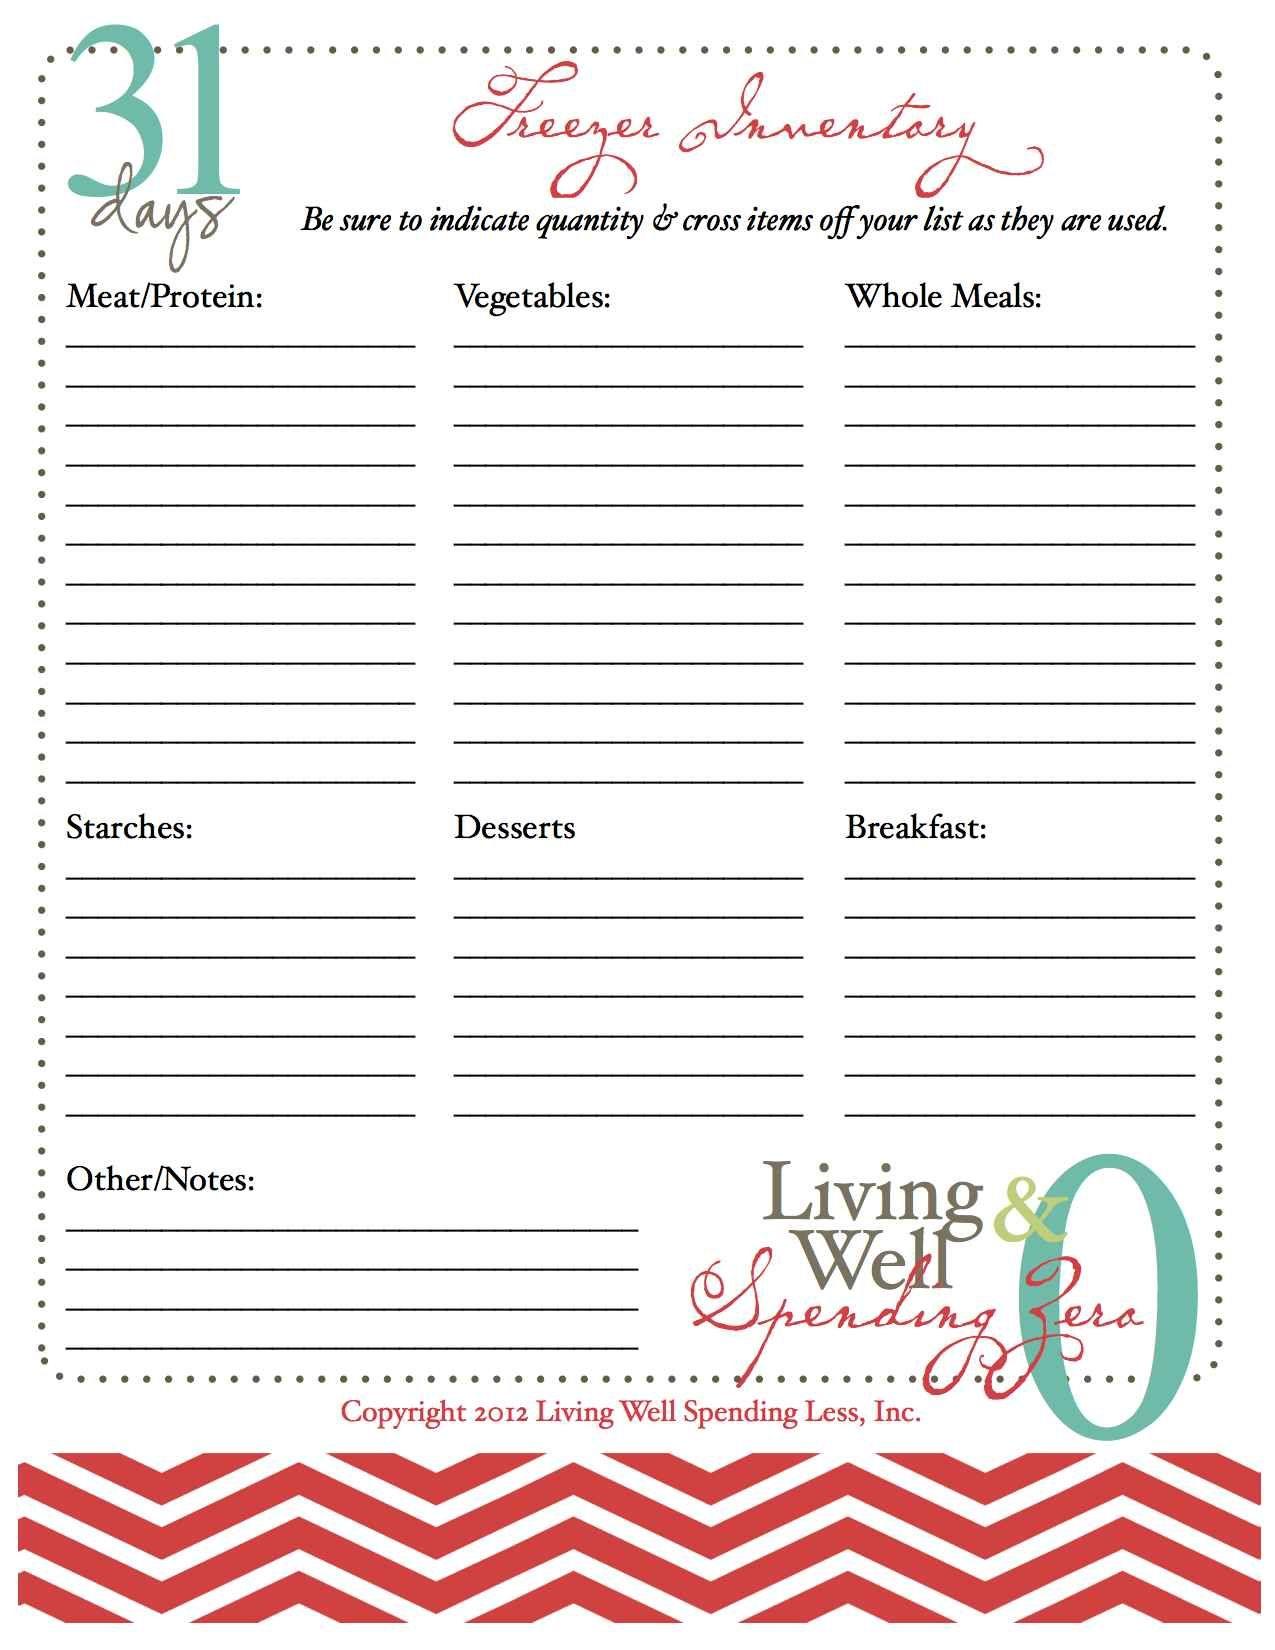 Freezer Inventory Printable Worksheet